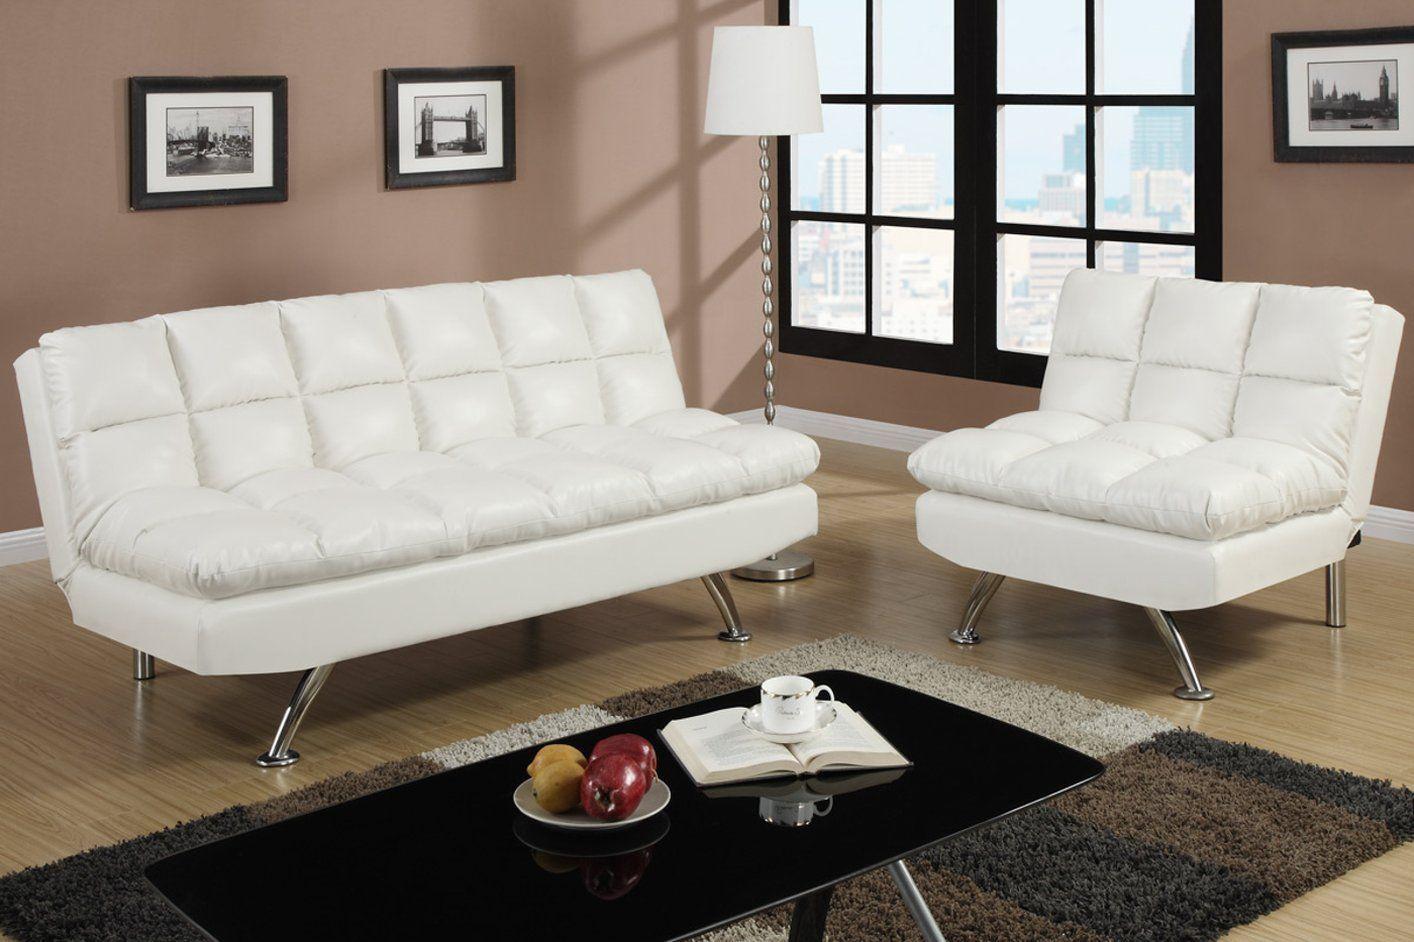 White Faux Leather Sofa   Pinterest   Faux leather sofa, Leather ...